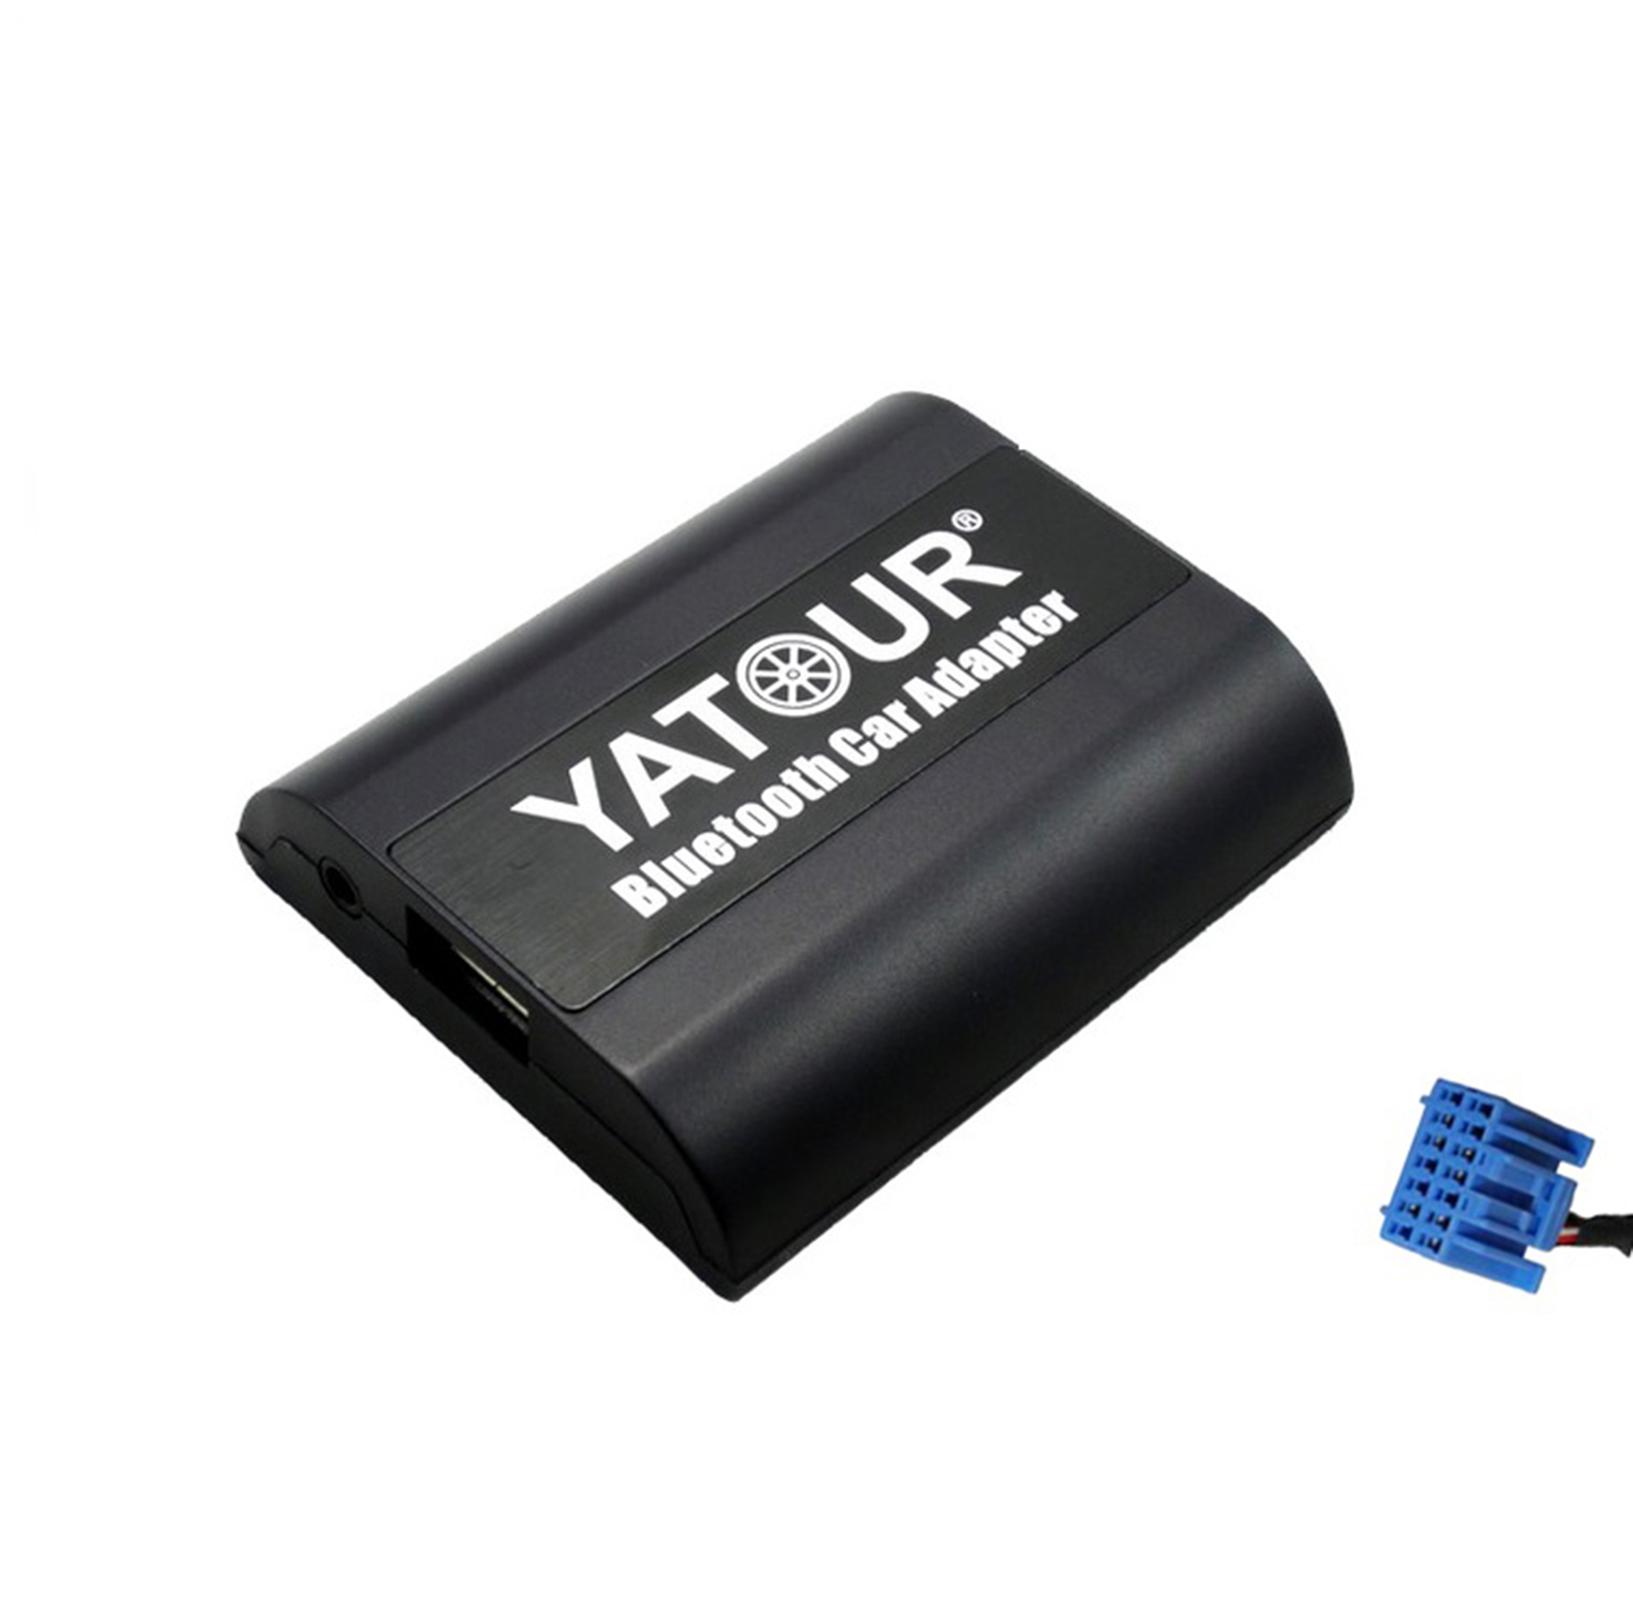 Kit Mains libres Bluetooth téléphonie & streaming audio pour Honda Accord, Civic, CR-V, Insight, Odyssey, Pilot, Prelude & S2000 - HON 2.3